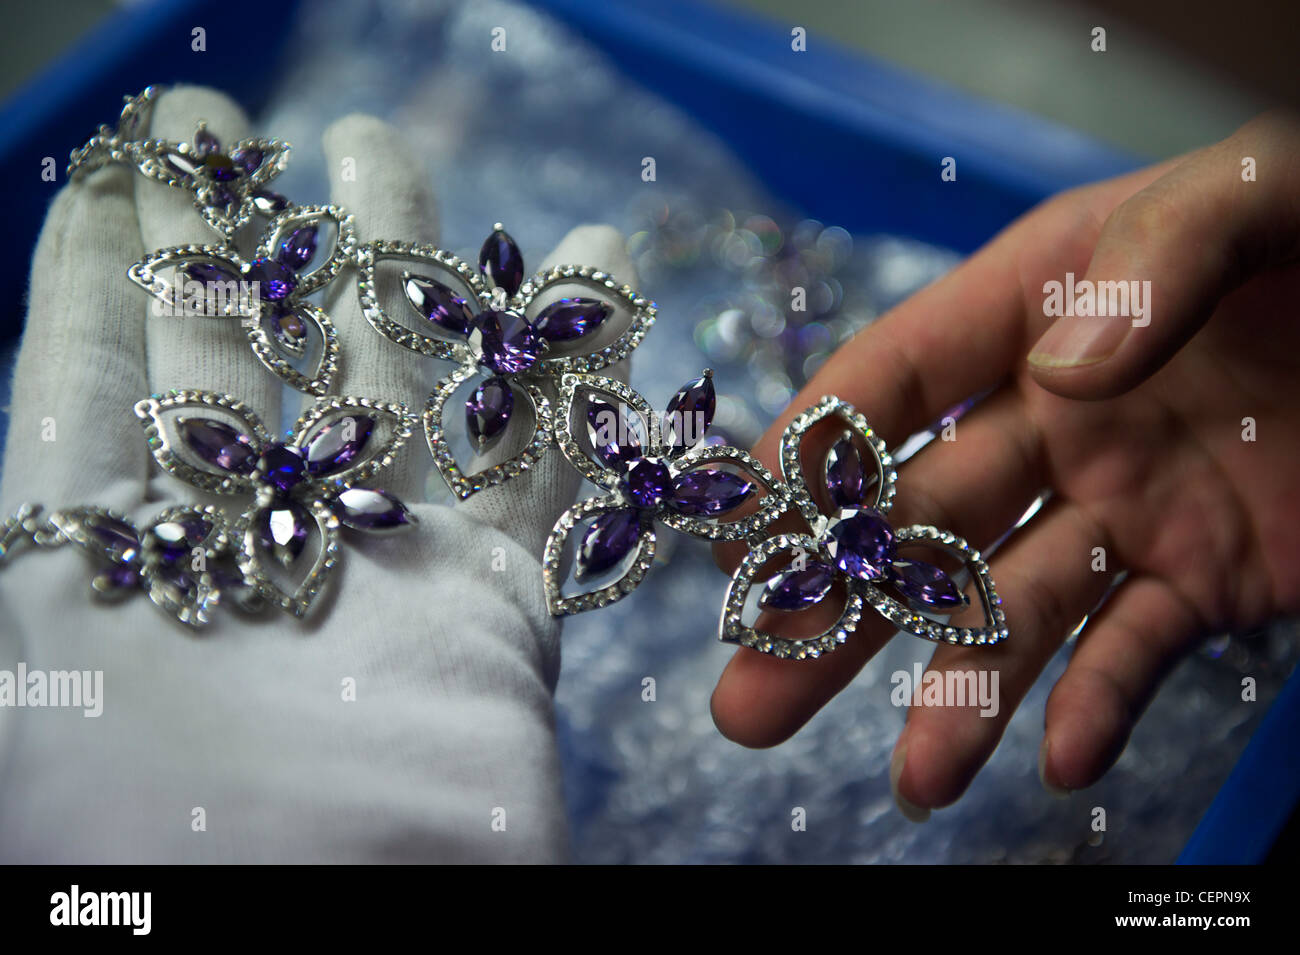 Employees make fashion jewelry in Zhejiang Neoglory Jewelry Co., Ltd. in Yiwu, Zhejiang, China.  07-Nov-2011 - Stock Image